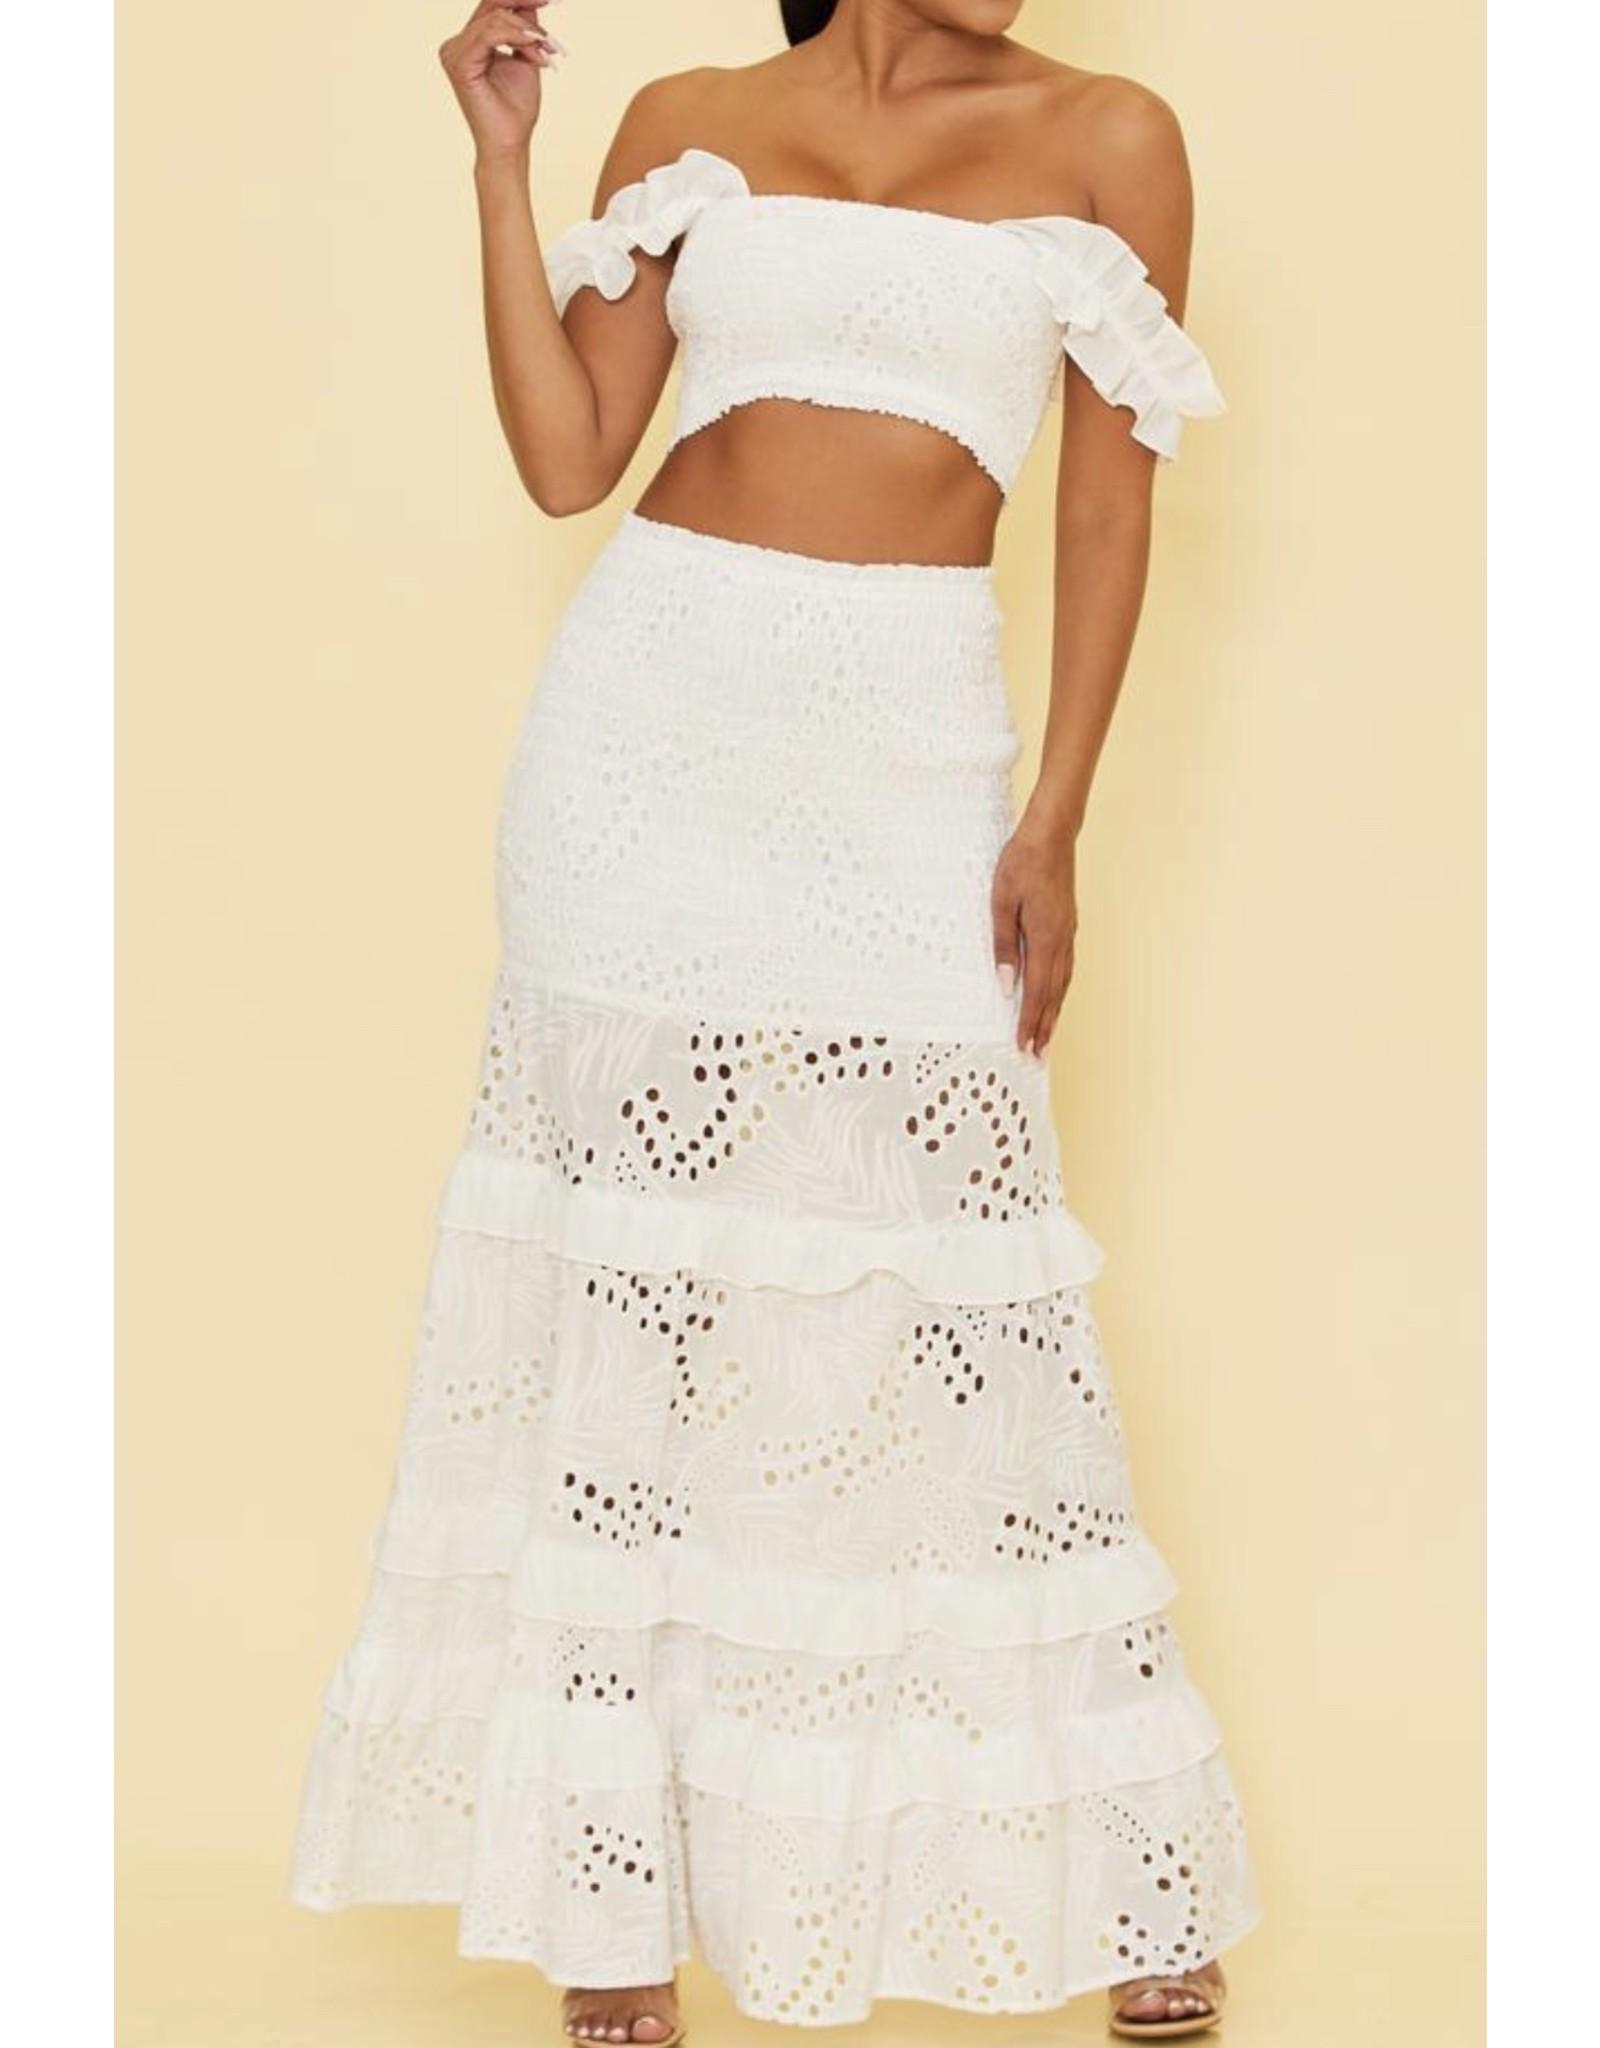 Smocked Detail Eyelet Lace Skirt Set - White